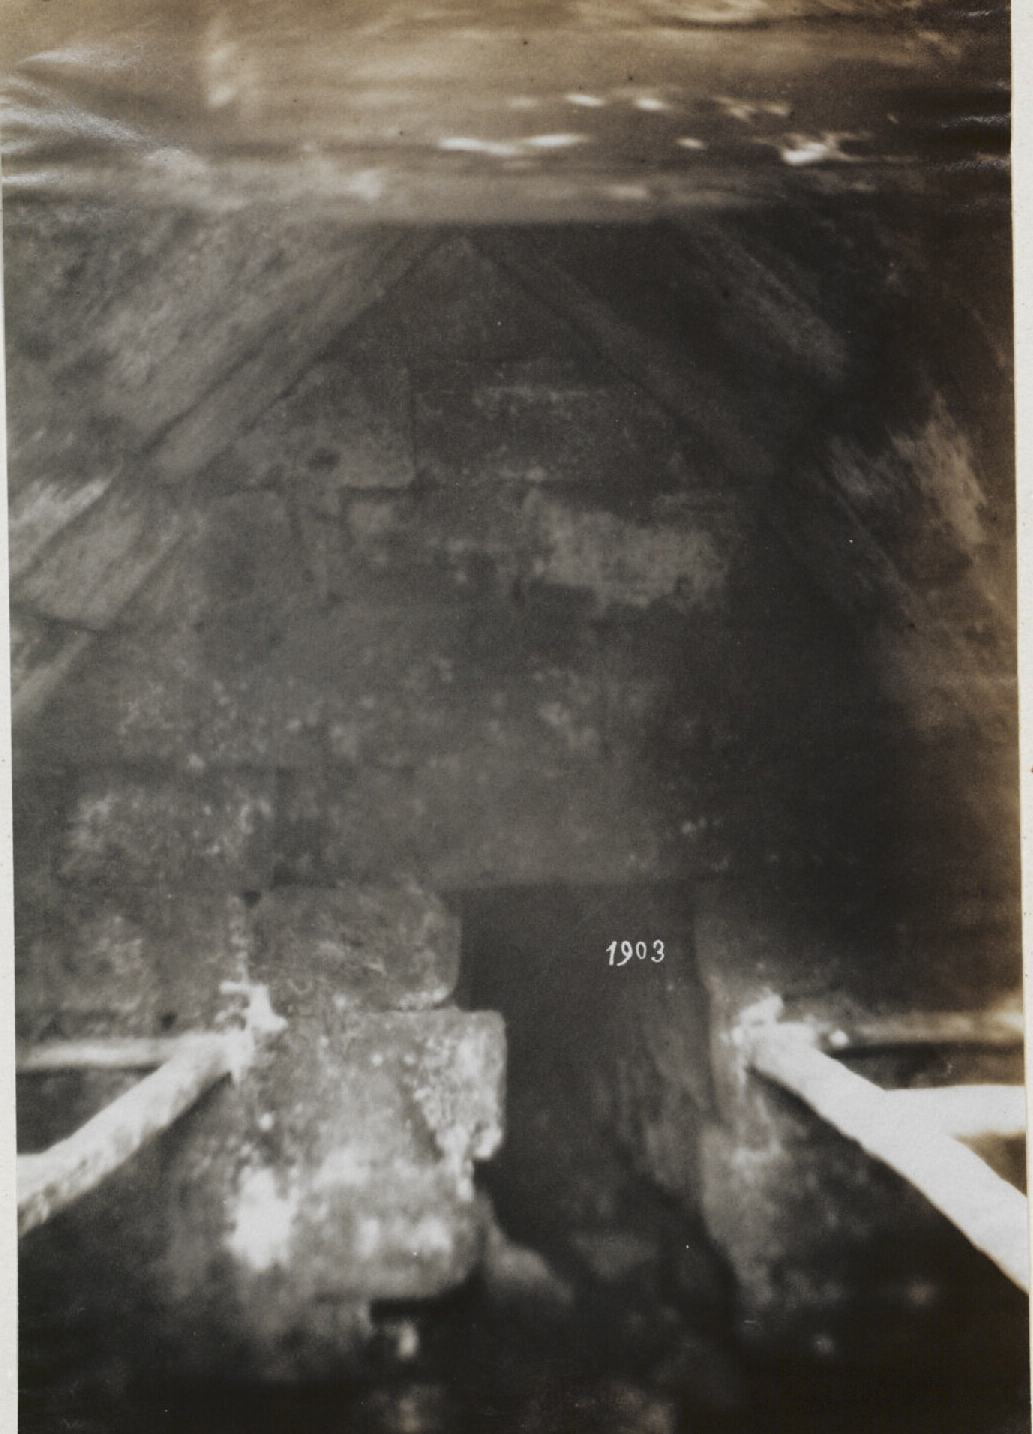 Тускул.  Вход в акведук